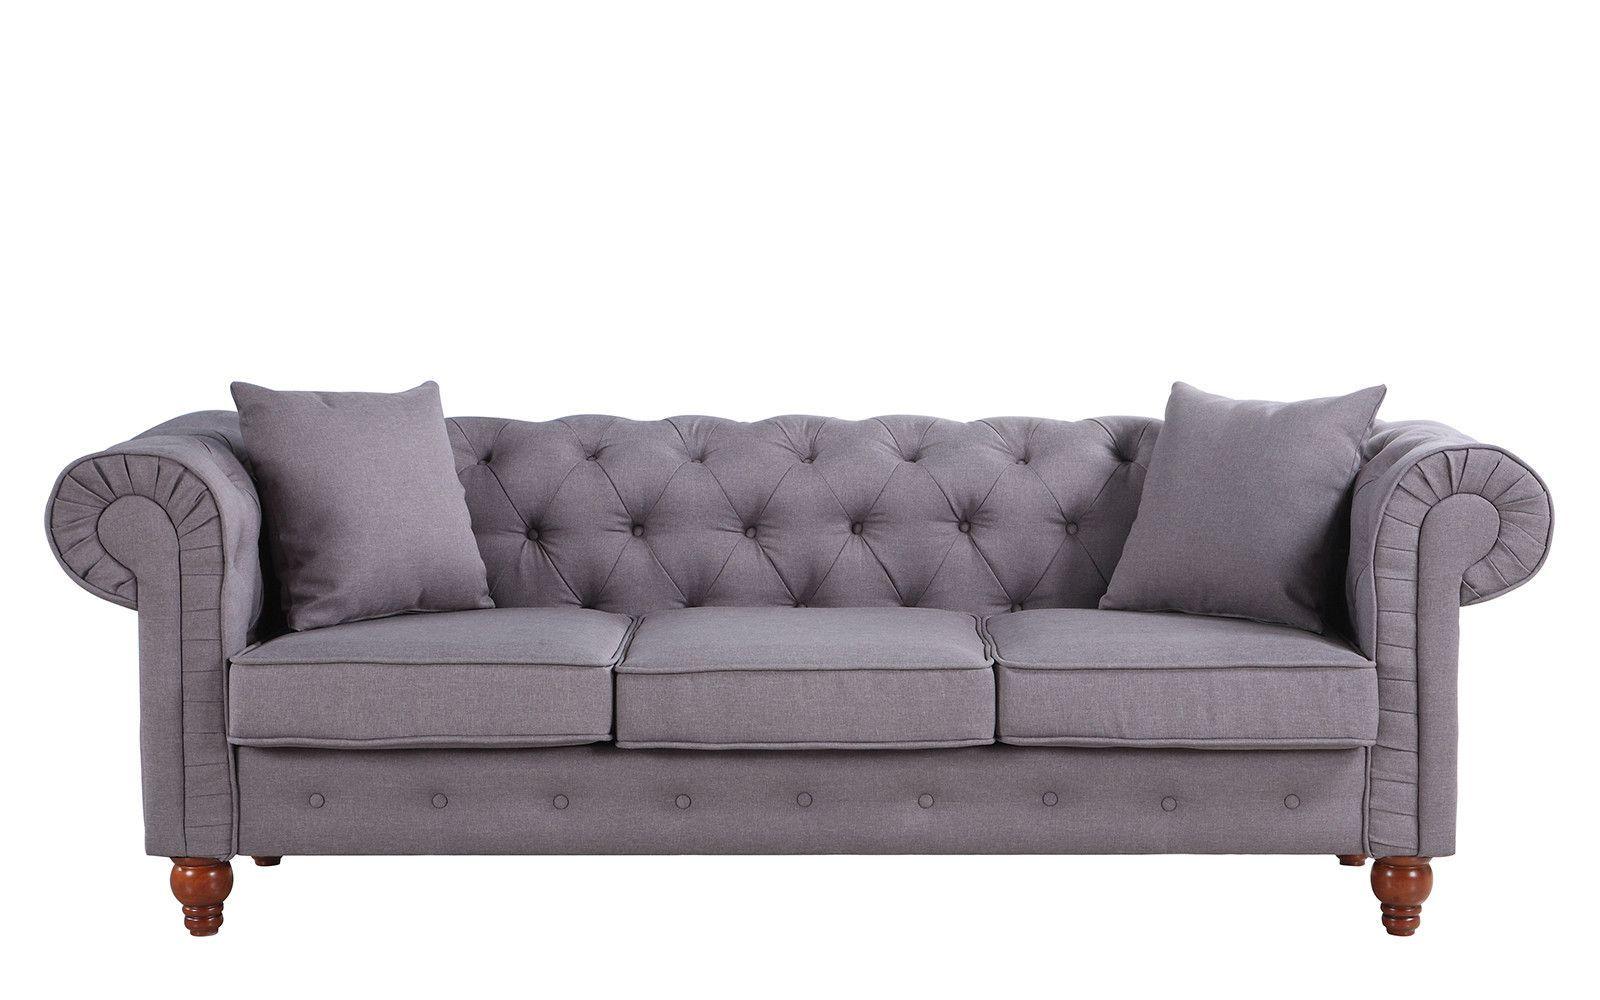 Sofasandstuff Reviews Paula Deen Sleeper Sofa Grey Fabric Chesterfield Uk Review Home Co